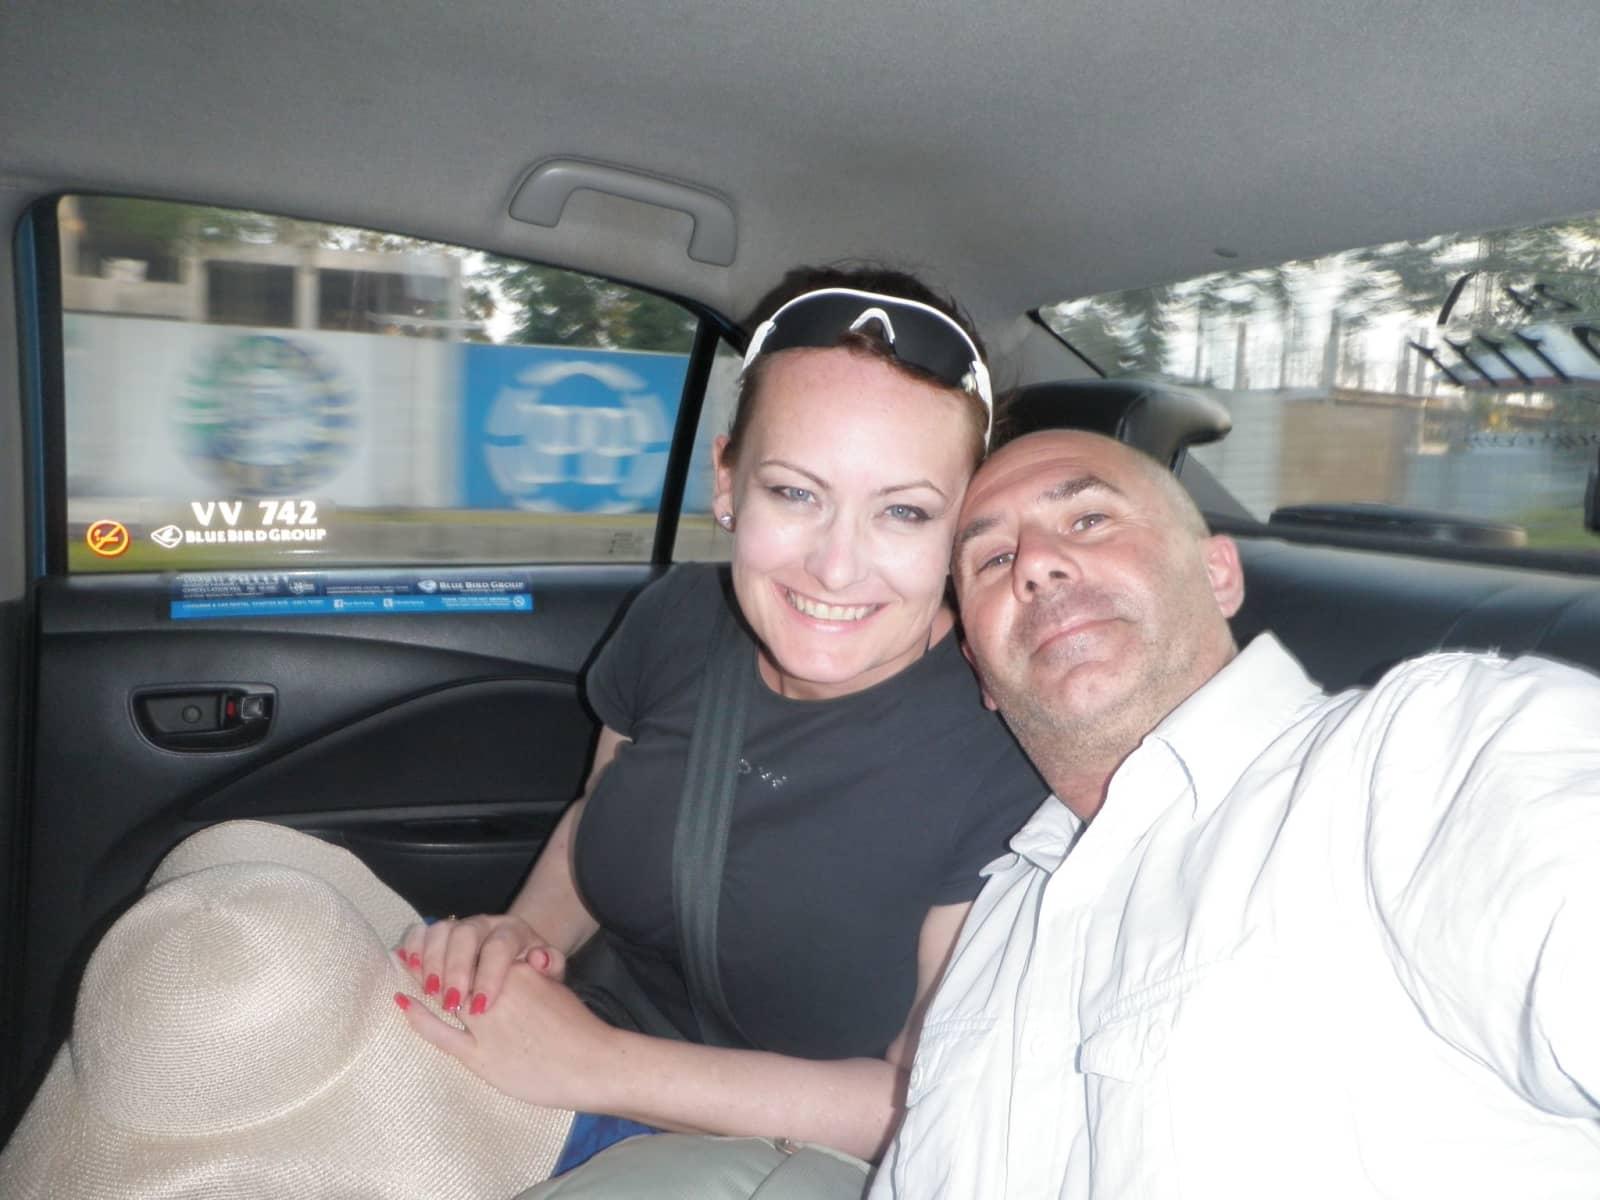 Gary & Bernadine from Perth, Western Australia, Australia